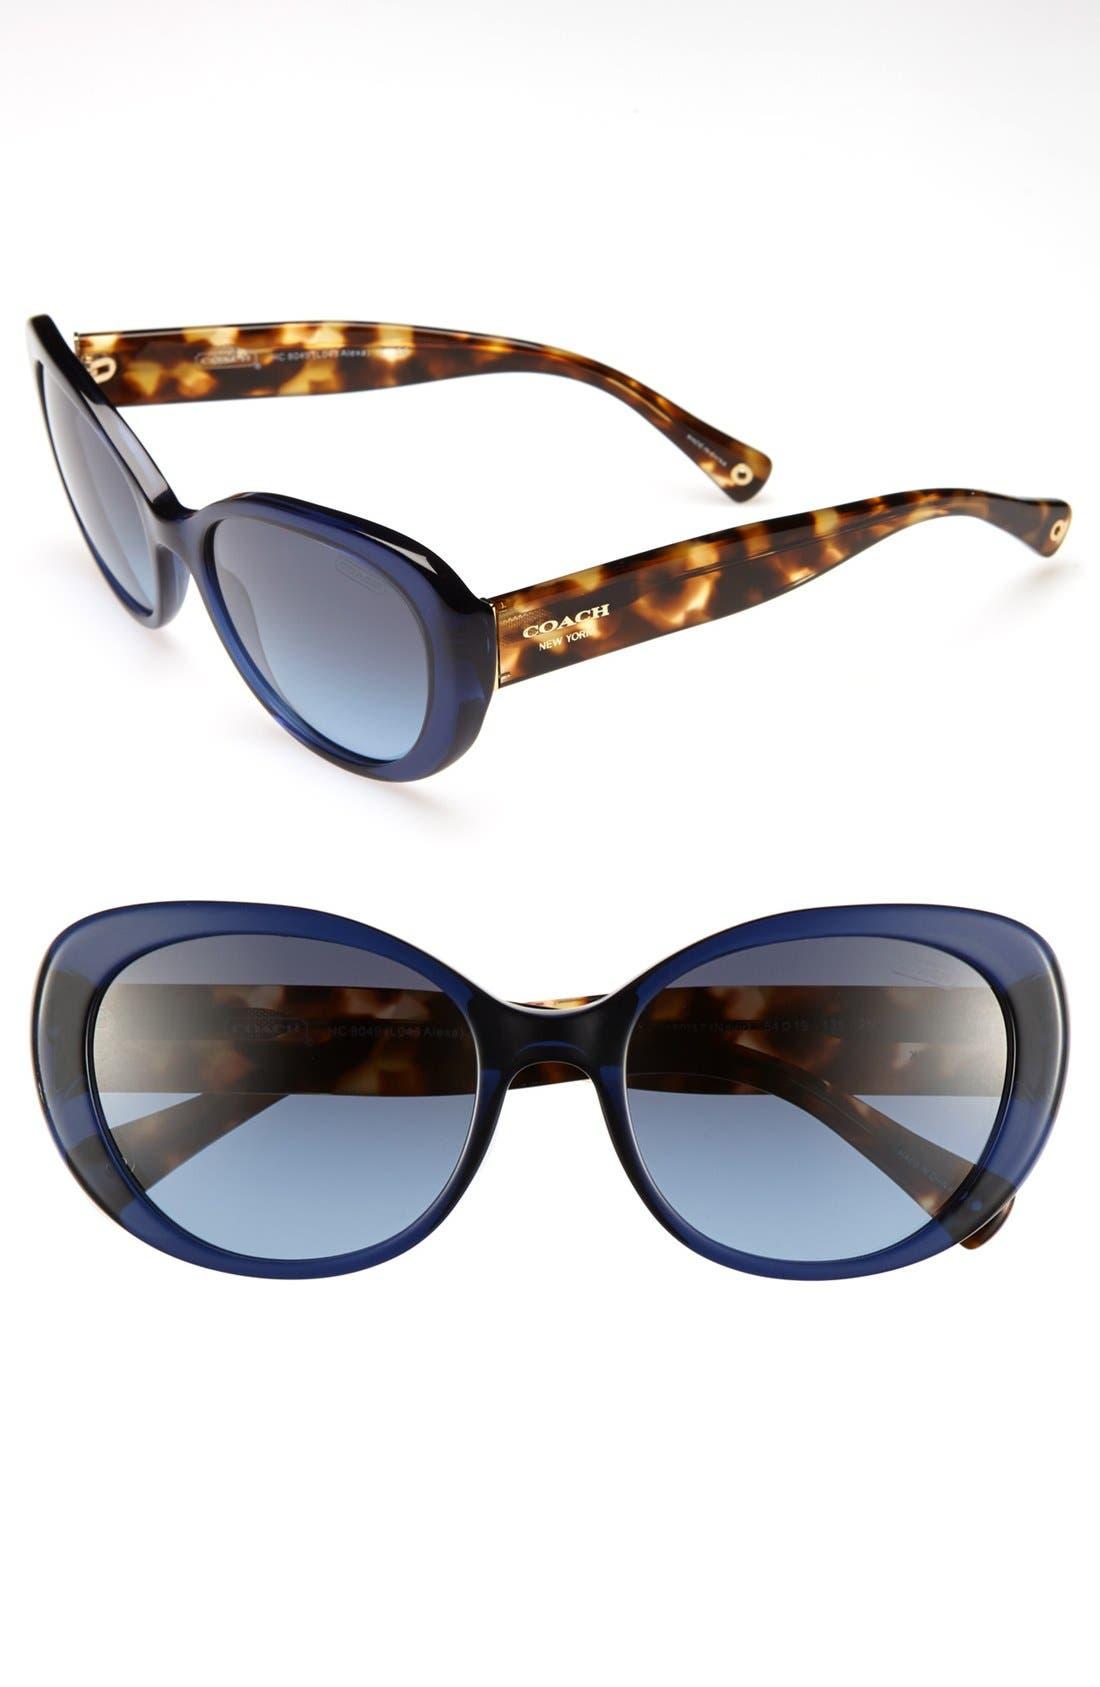 Main Image - COACH 'Alexa' 54mm Sunglasses